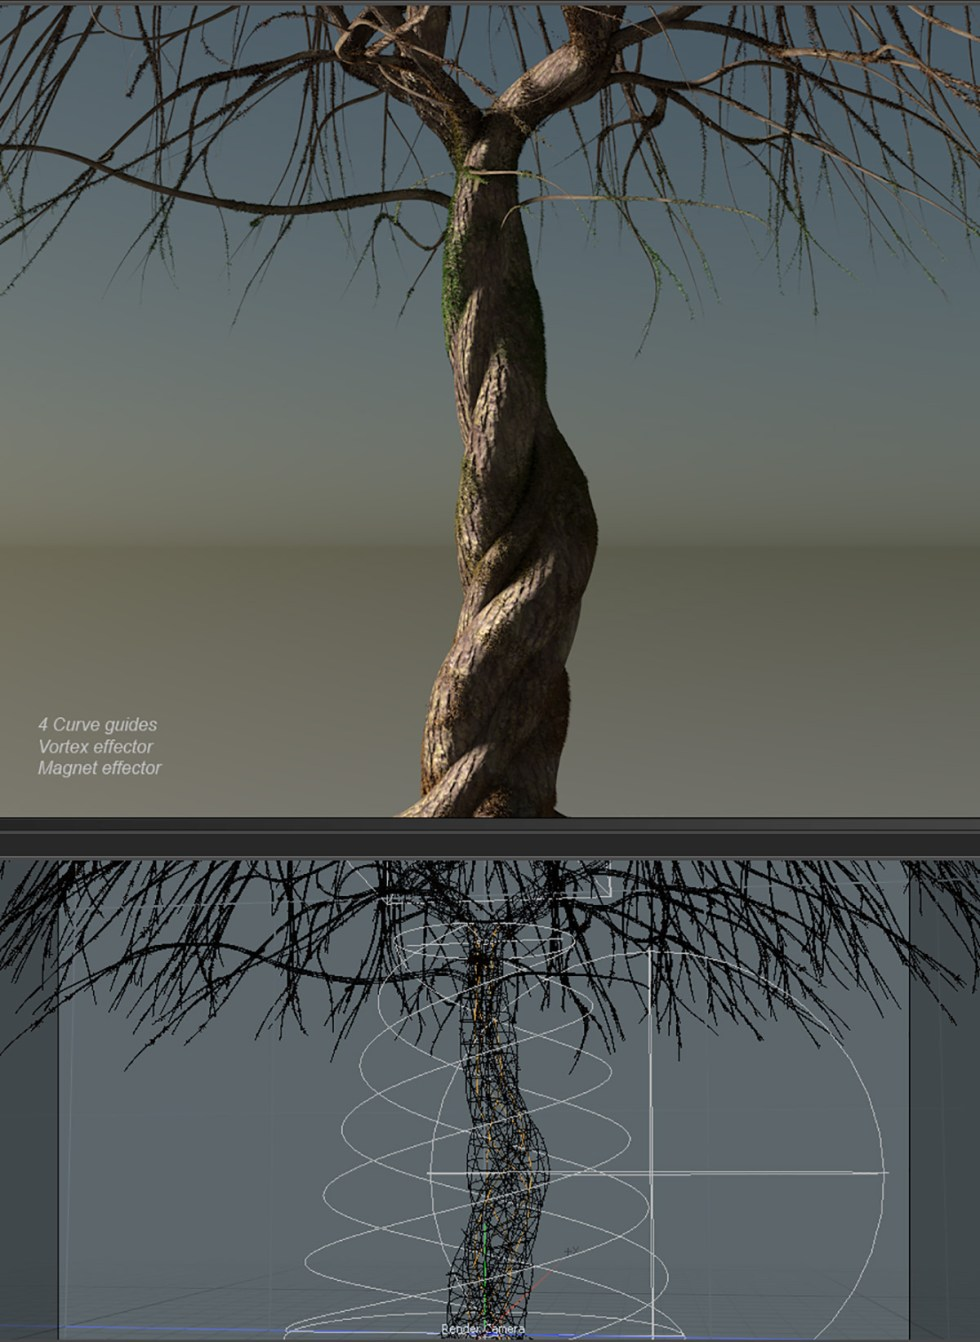 A spiral tree